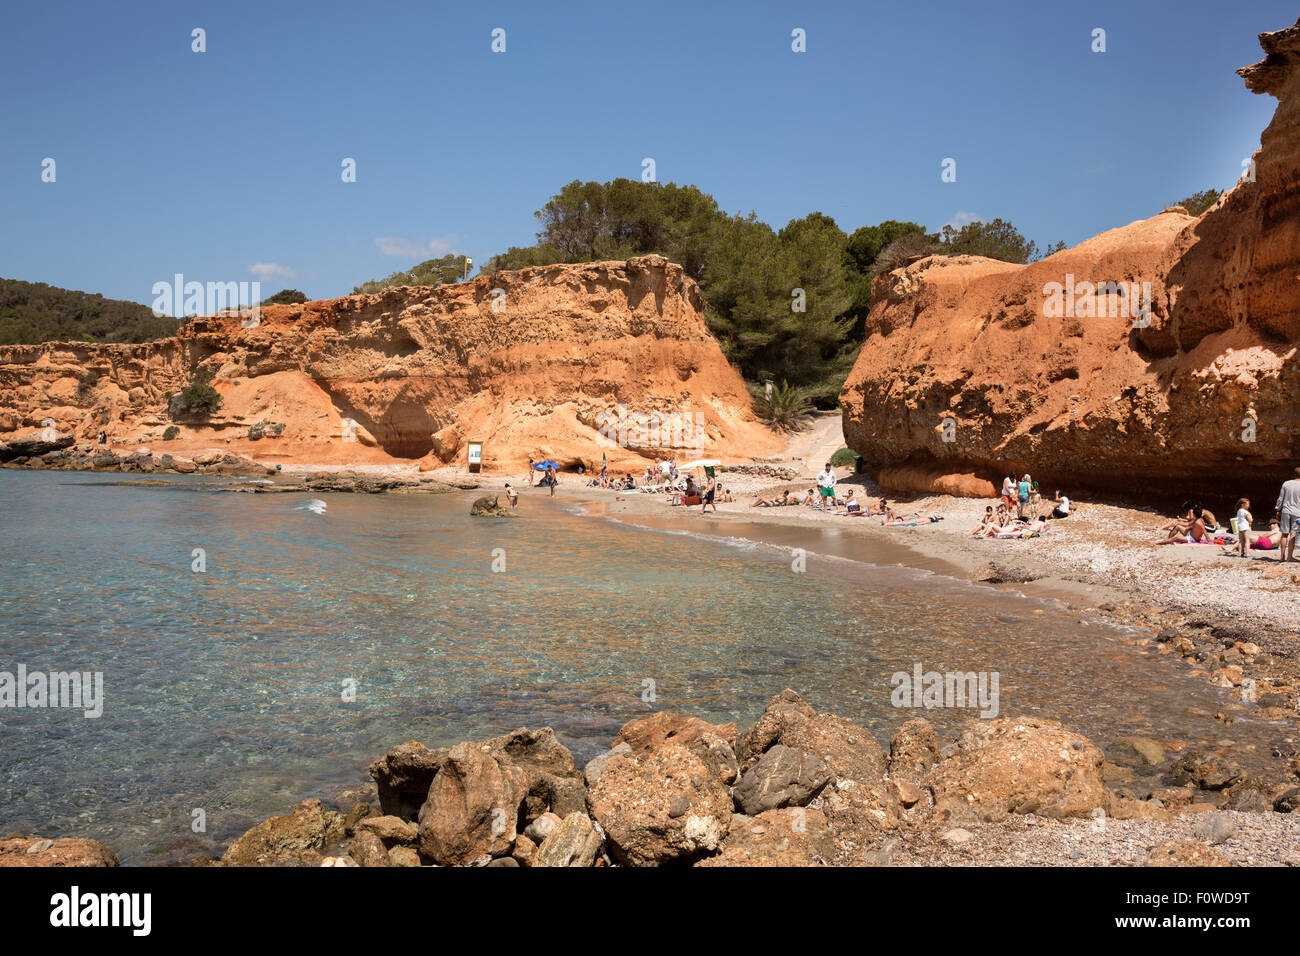 Sa Caleta beach Ibiza, Spain - Stock Image